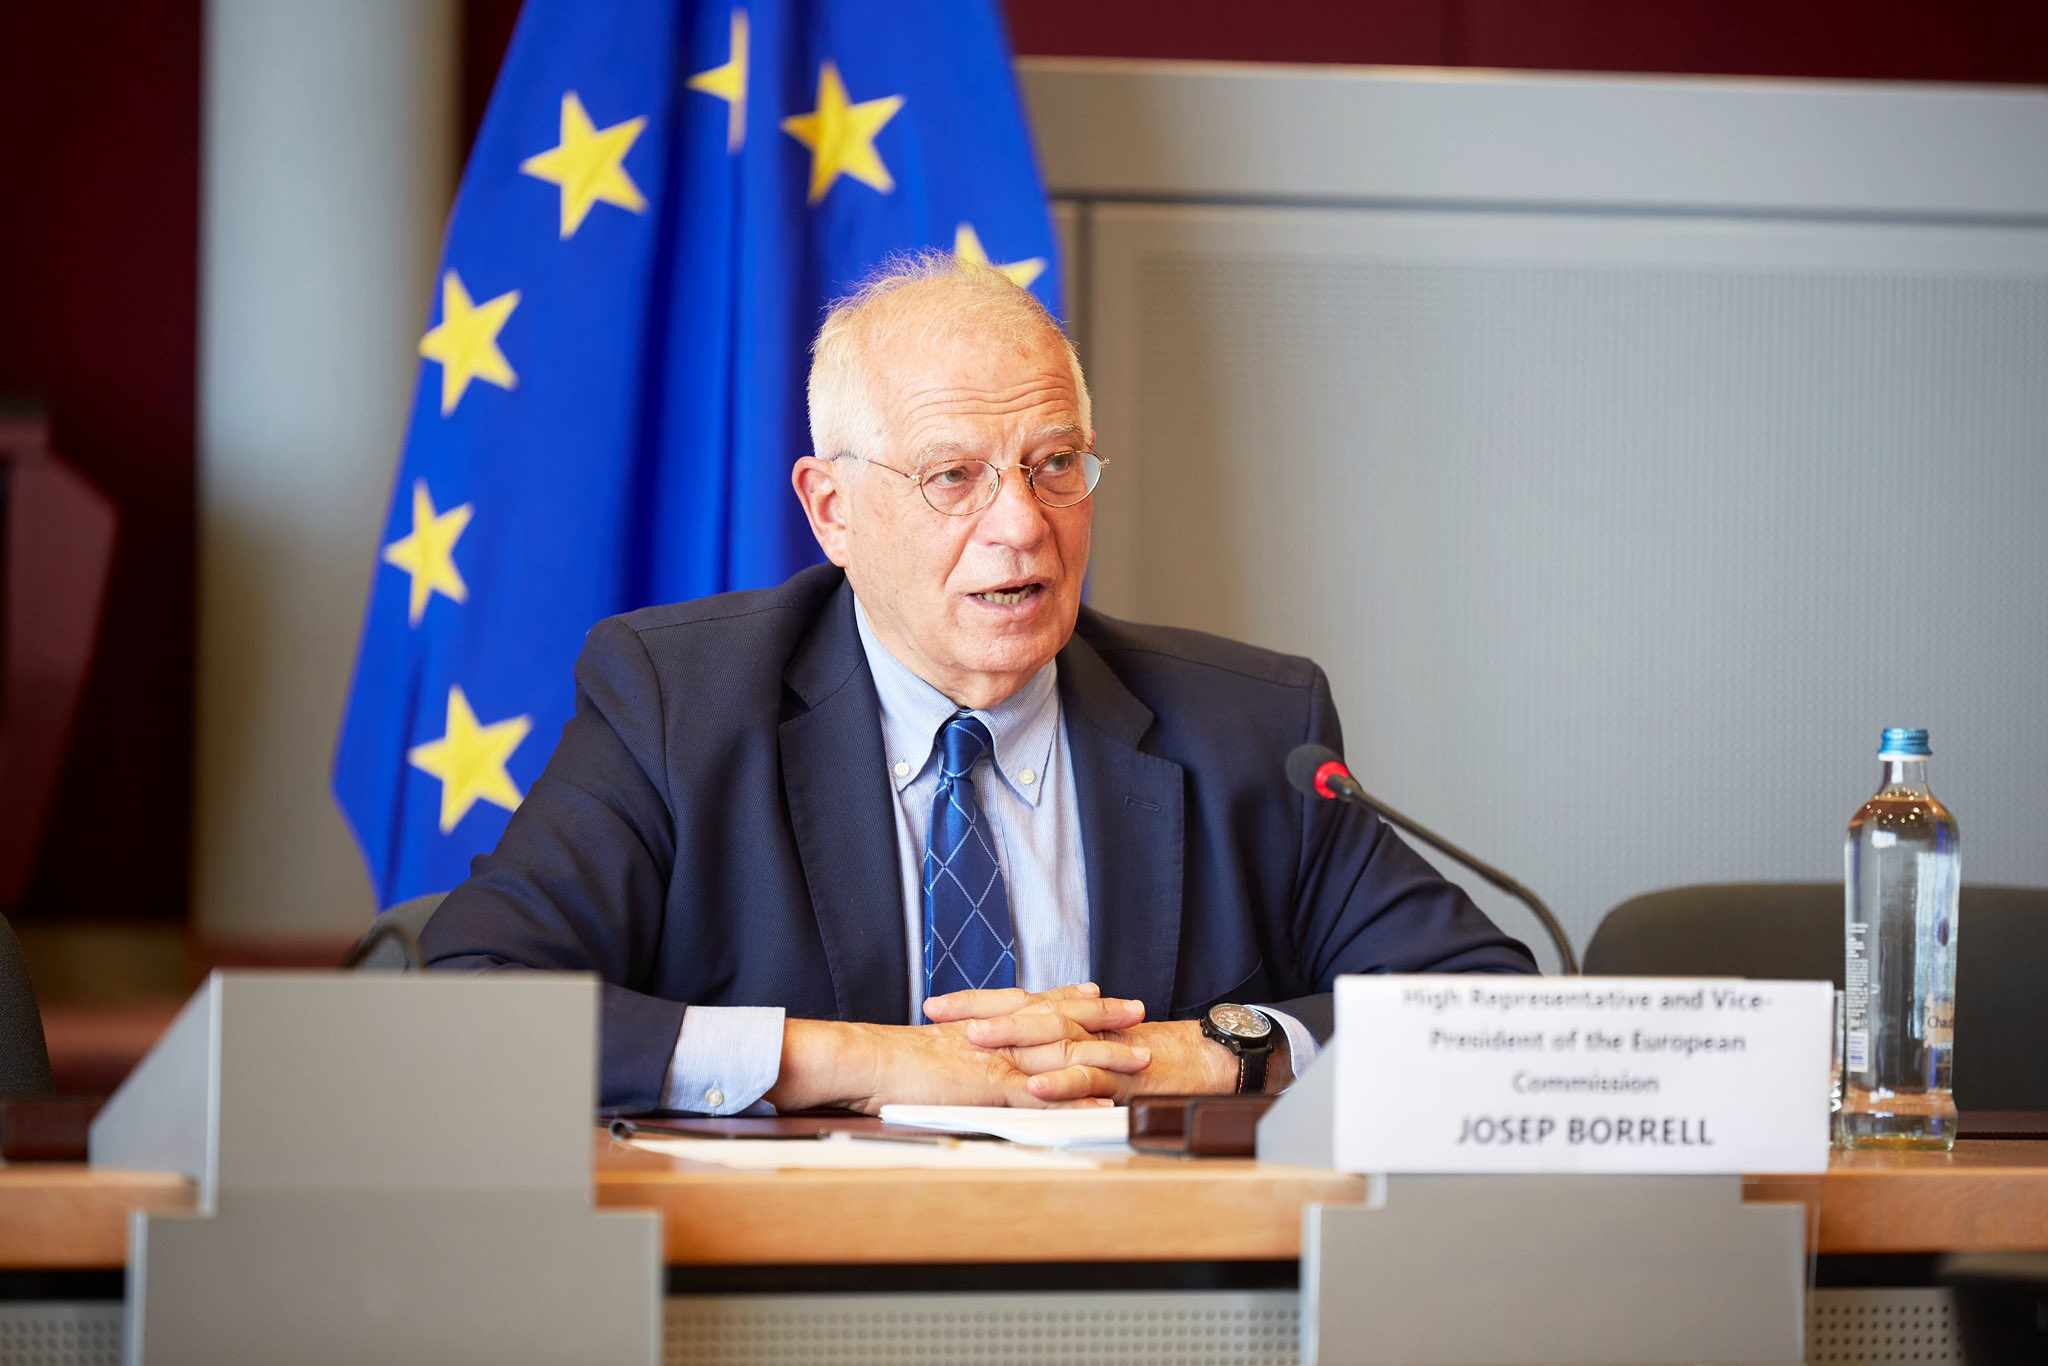 Borrell es un aliado institucional de la causa democrática venezolana / Foto: @JosepBorrellF